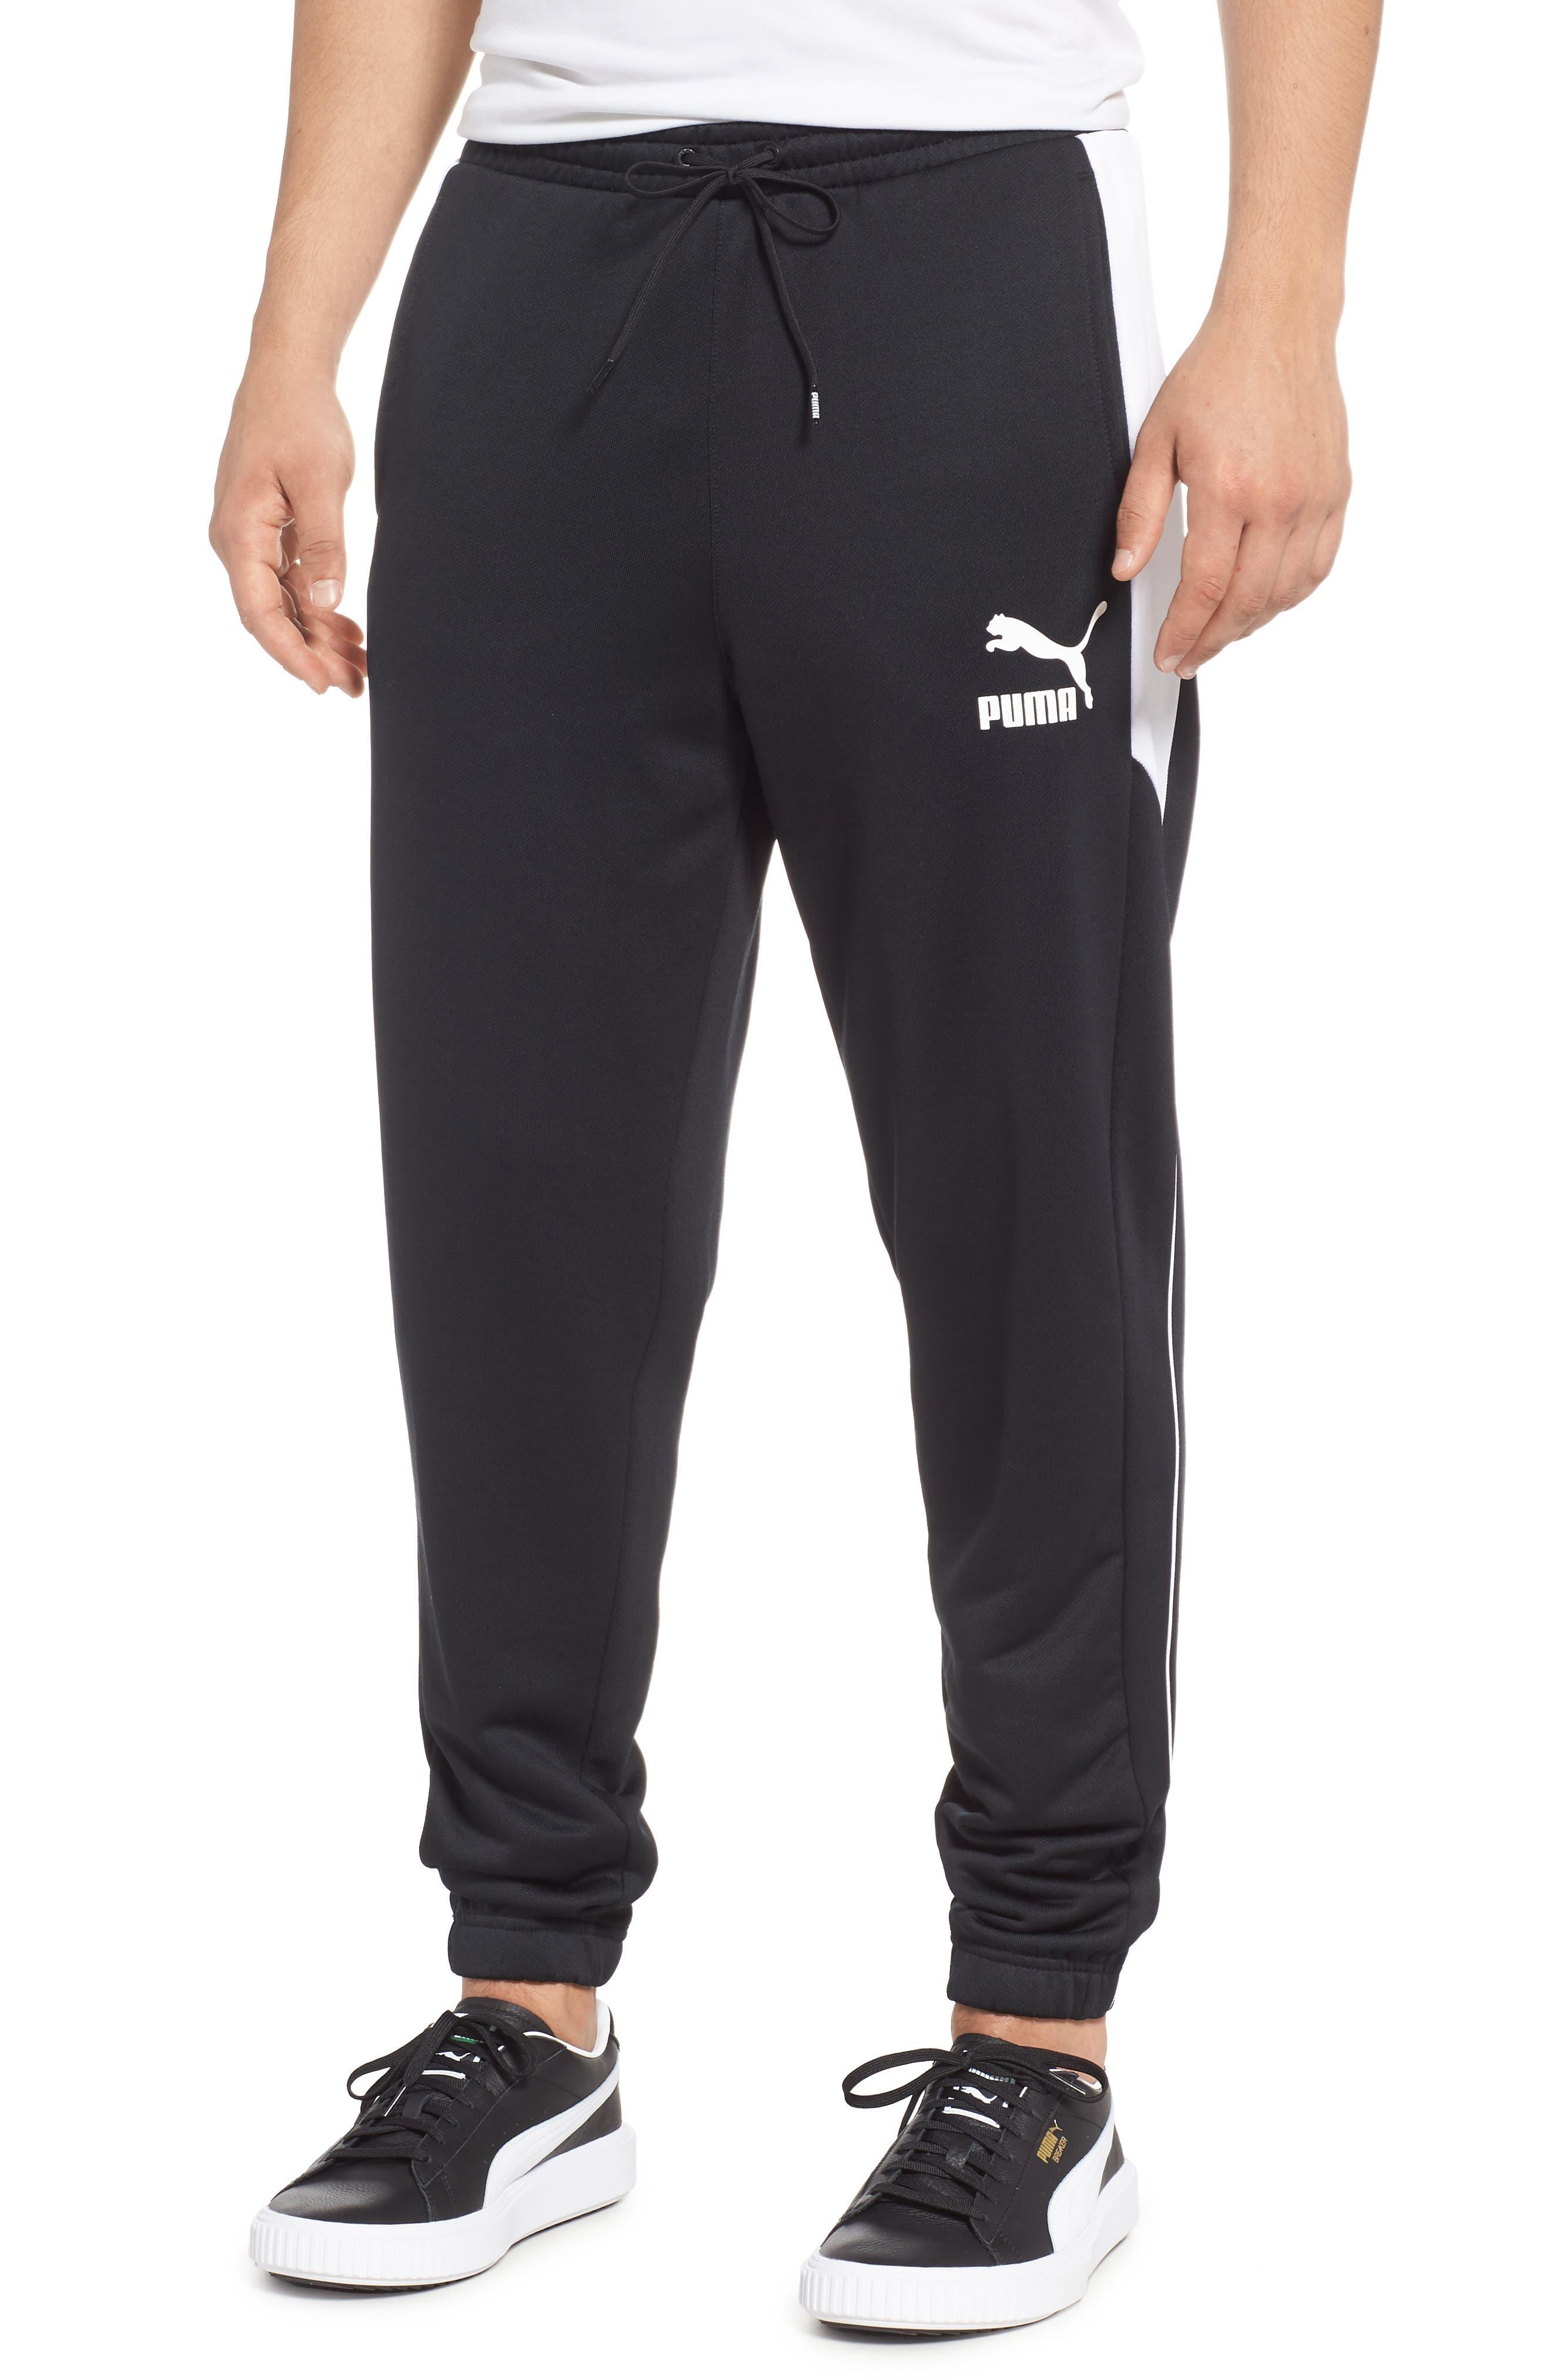 Men's Puma Retro Sweatpants